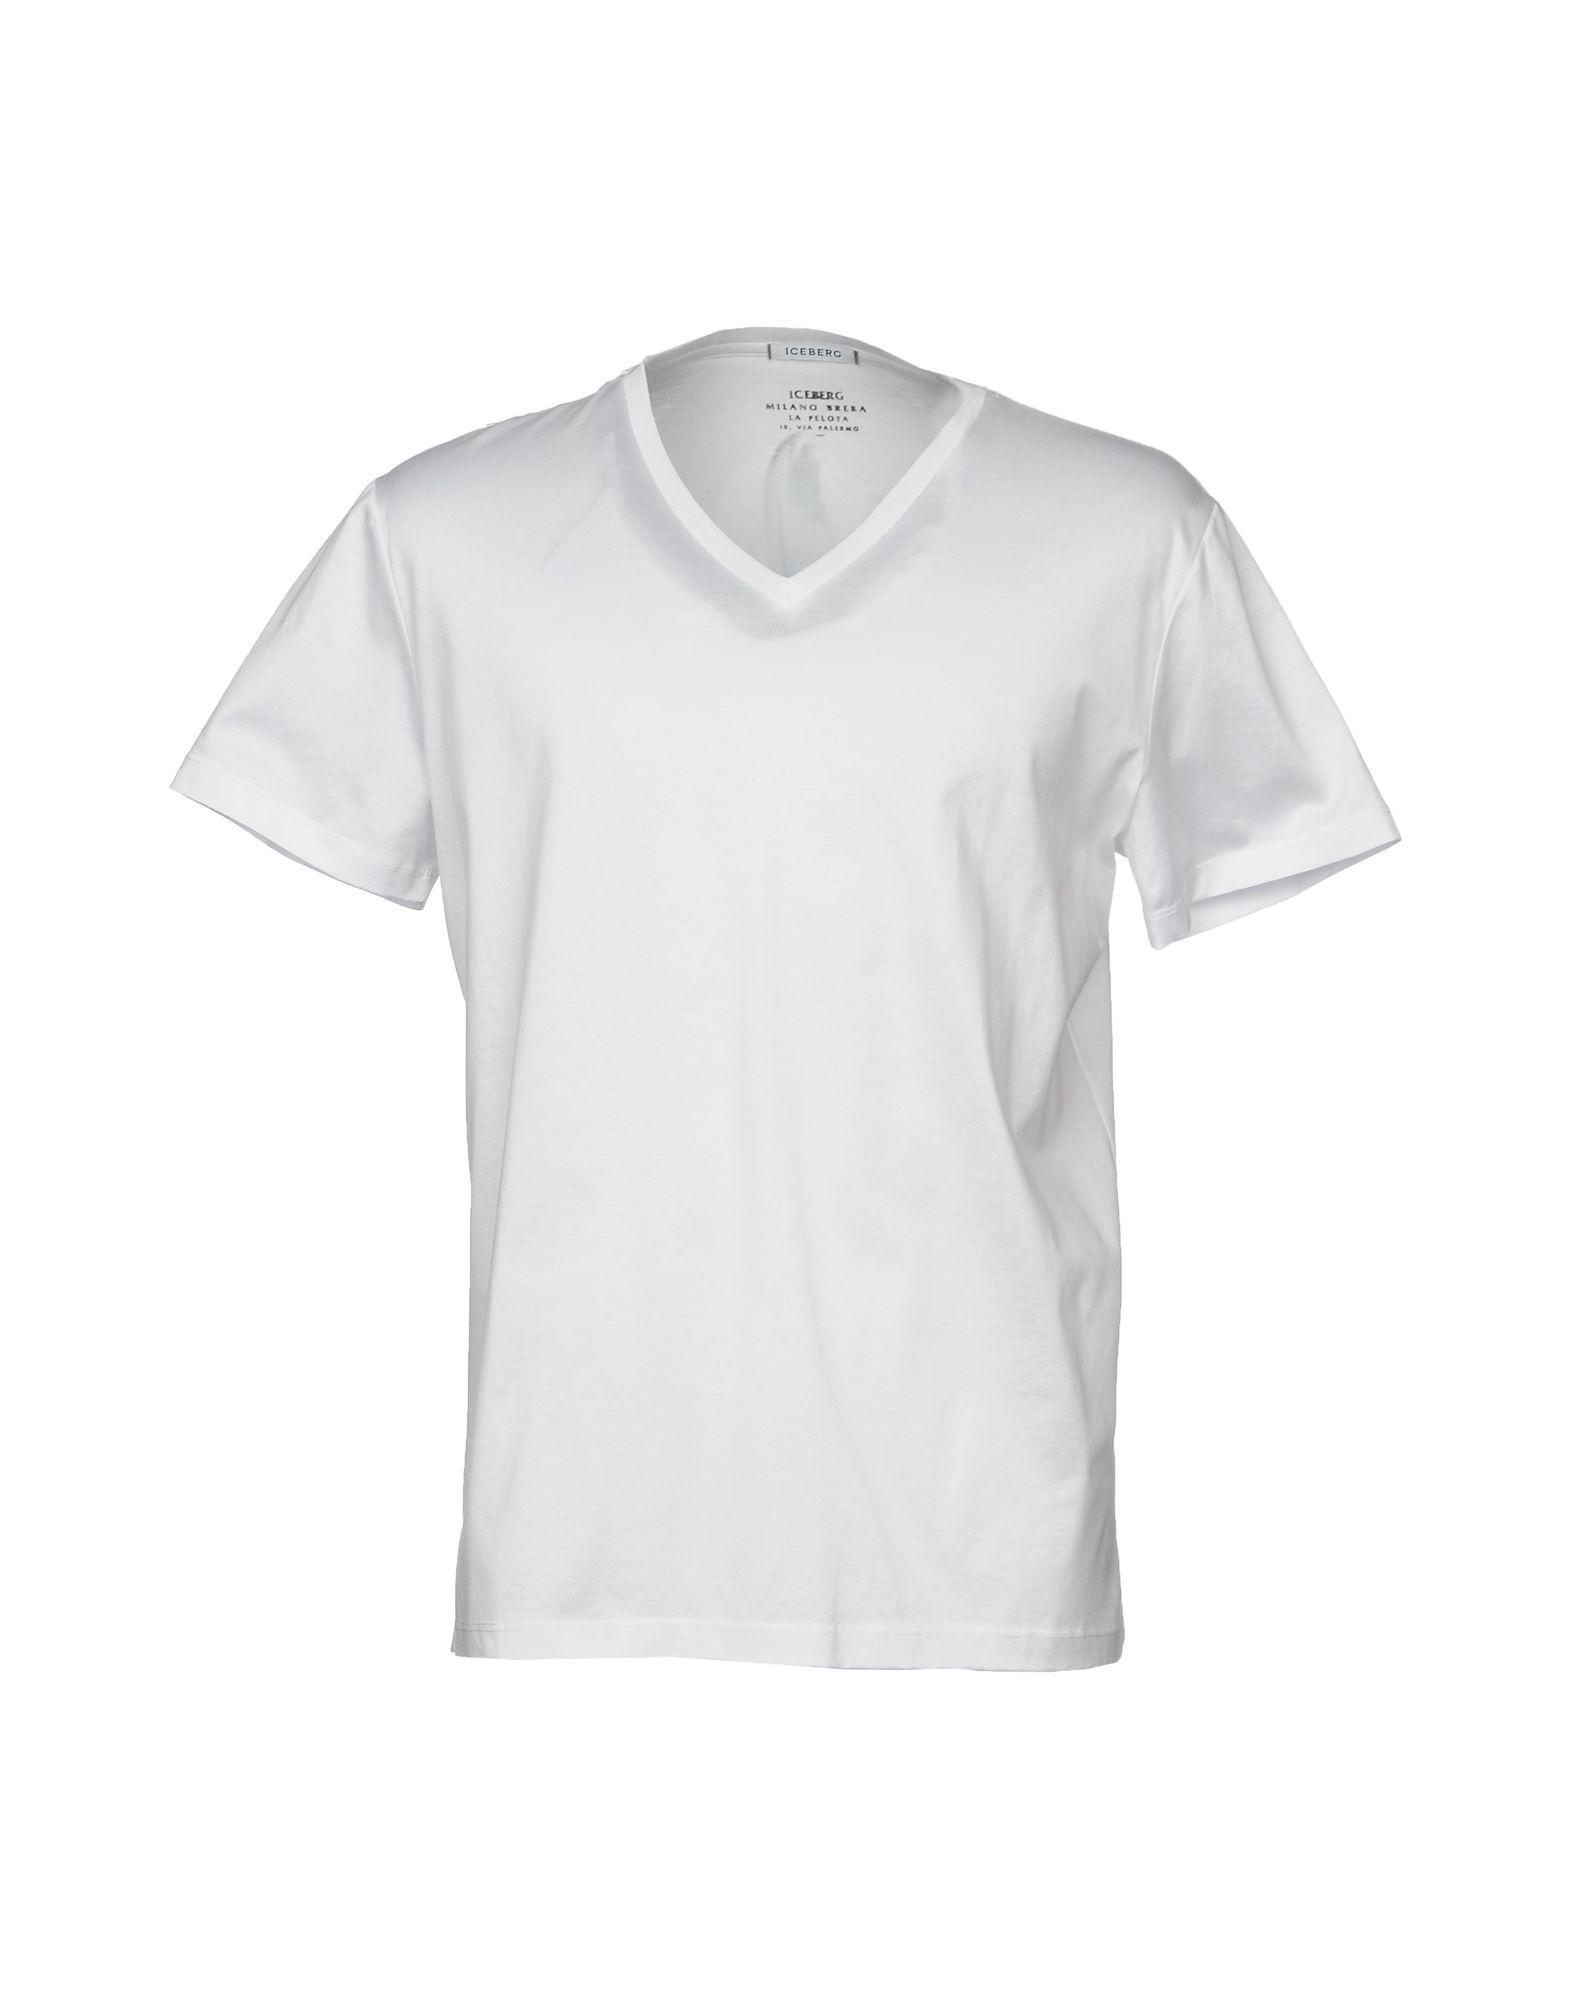 A buon mercato T-Shirt A buon mercato T-Shirt mercato Iceberg Uomo - 12122603BP bc09dc